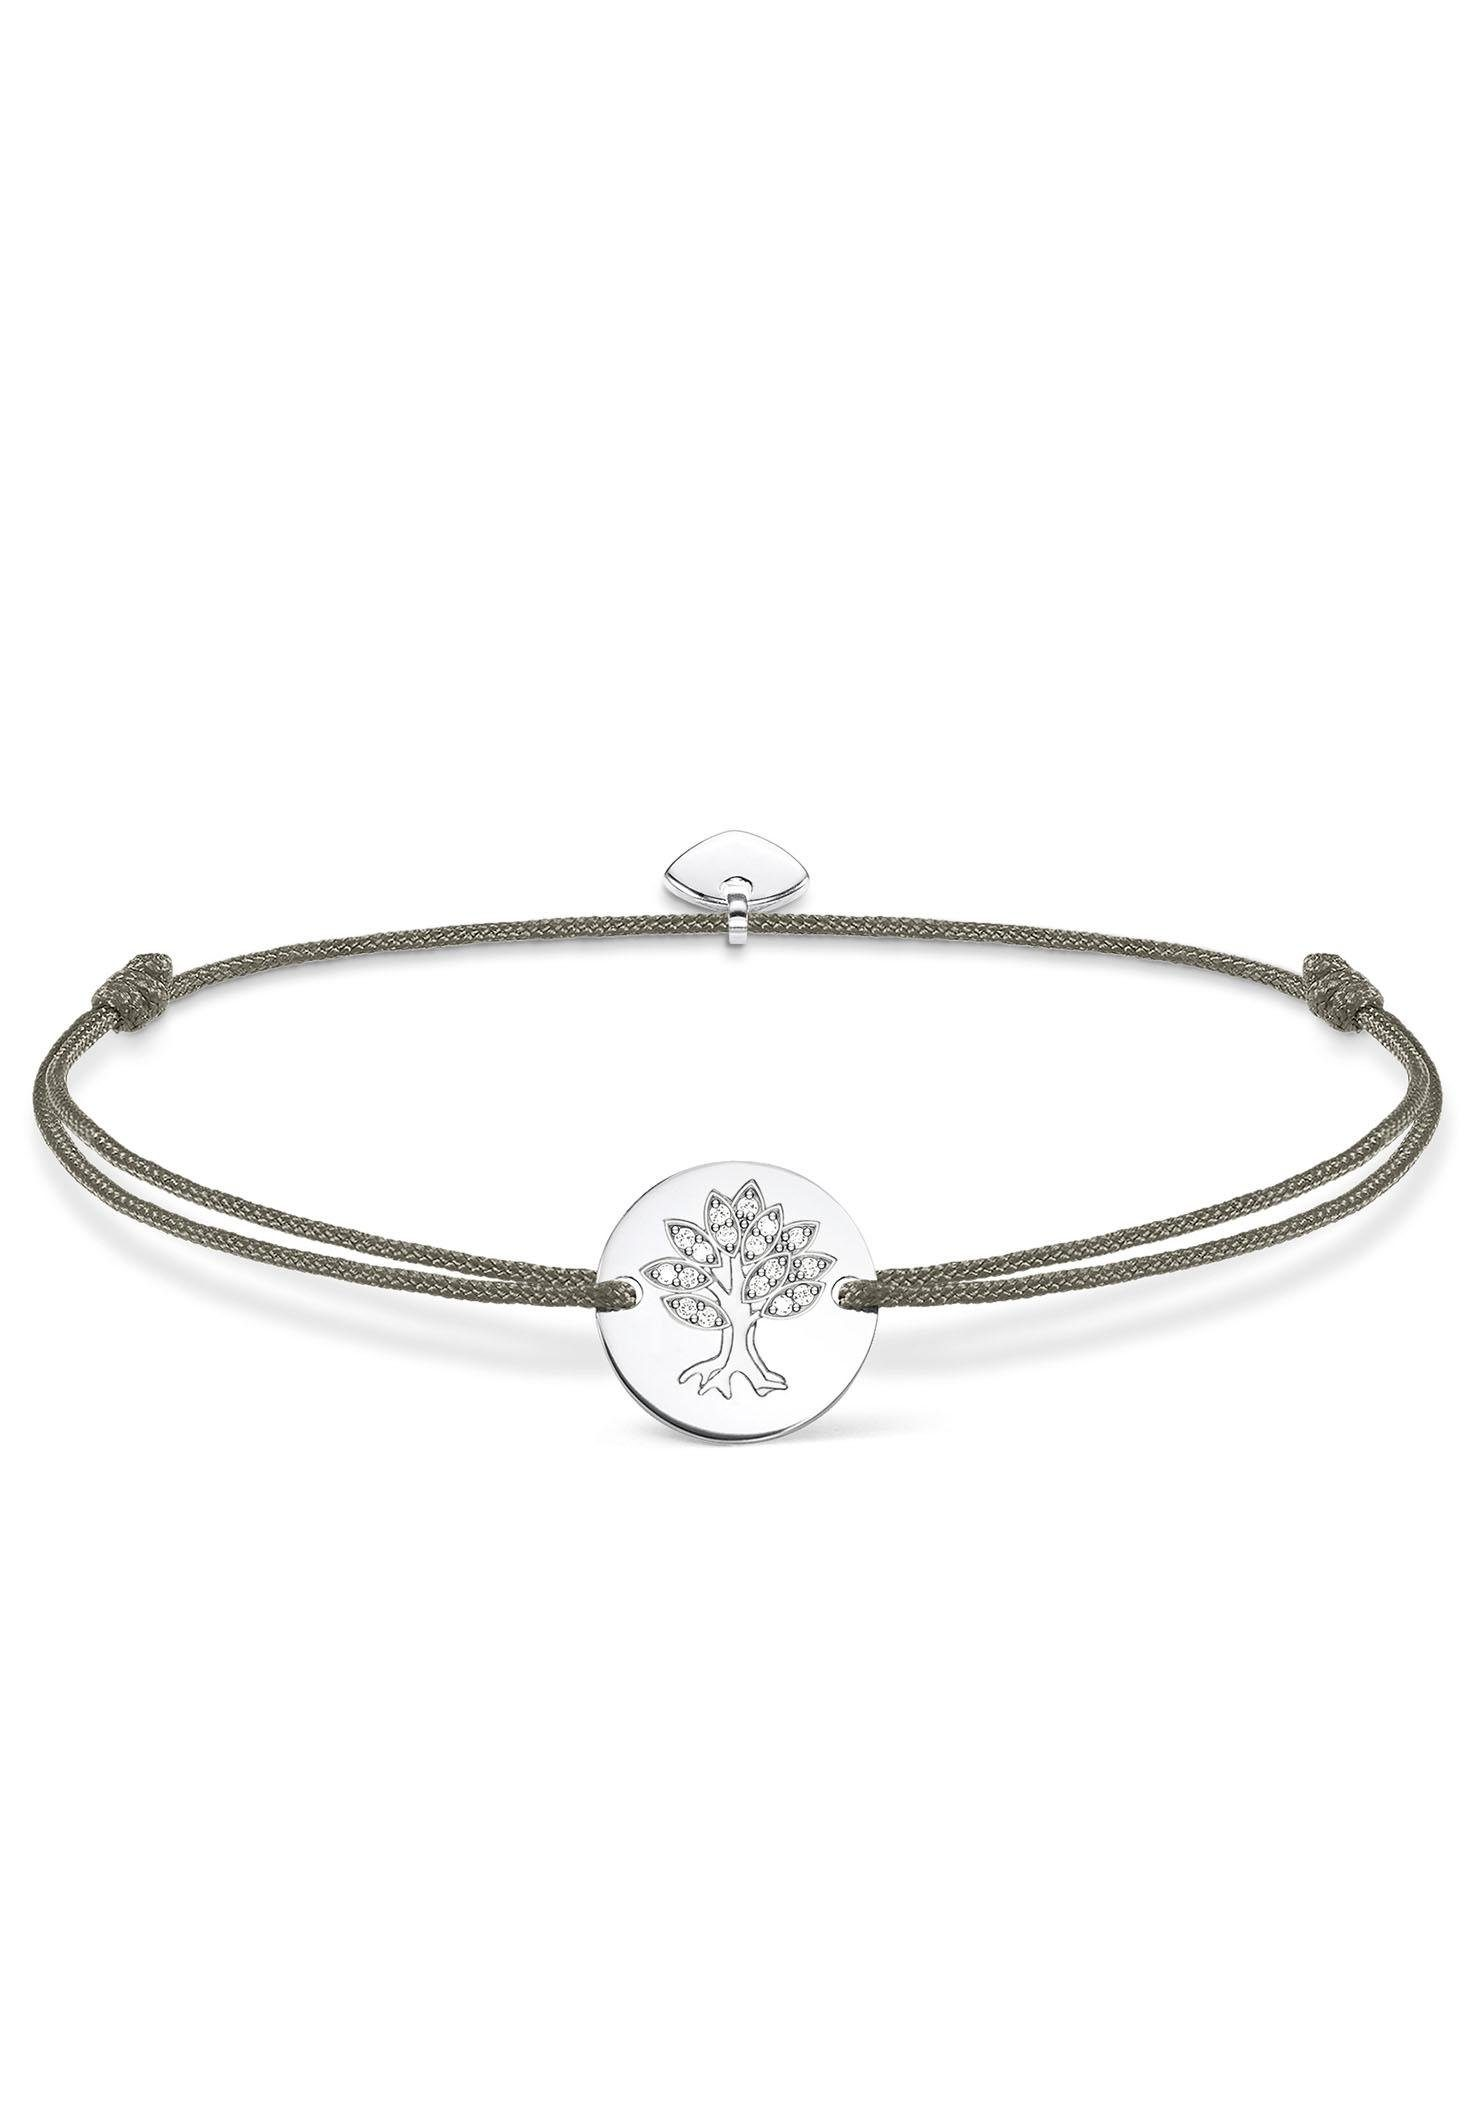 THOMAS SABO Armband »Lebensbaum, Little Secret, LS008-401-5-L20v« mit Zirkonia